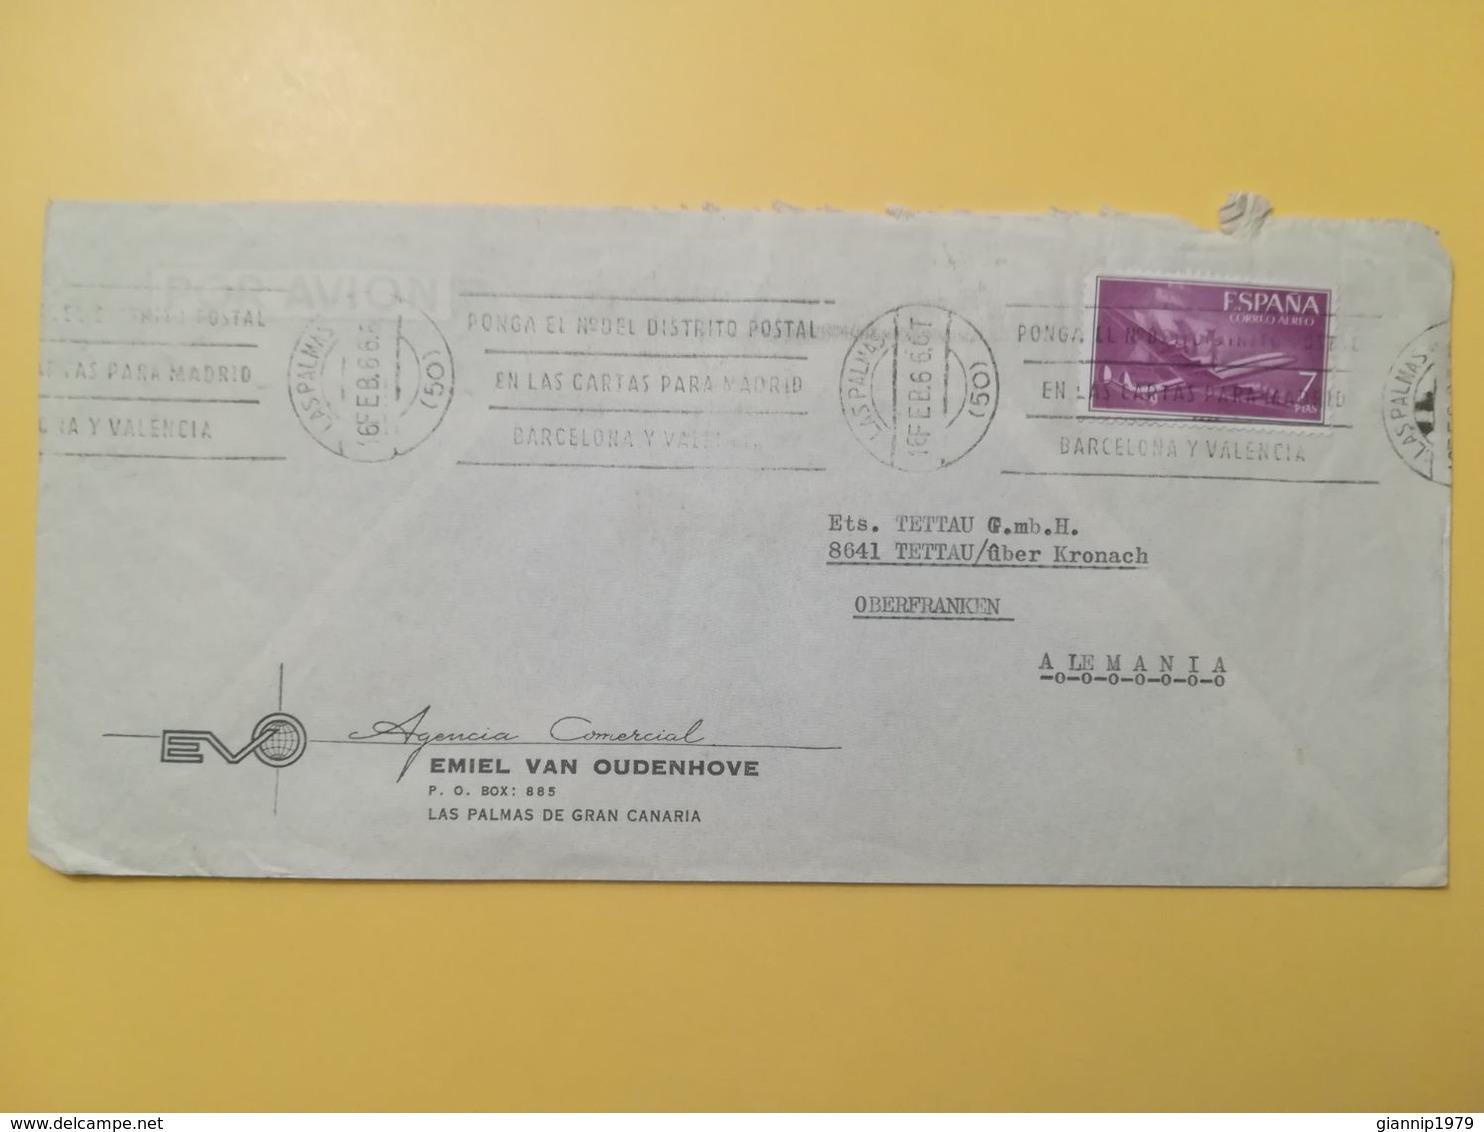 1966 BUSTA INTESTATA SPAGNA ESPANA BOLLO POSTA AEREA CORREO AEREO ANNULLO OBLITERE' LAS PALMAS - 1961-70 Briefe U. Dokumente